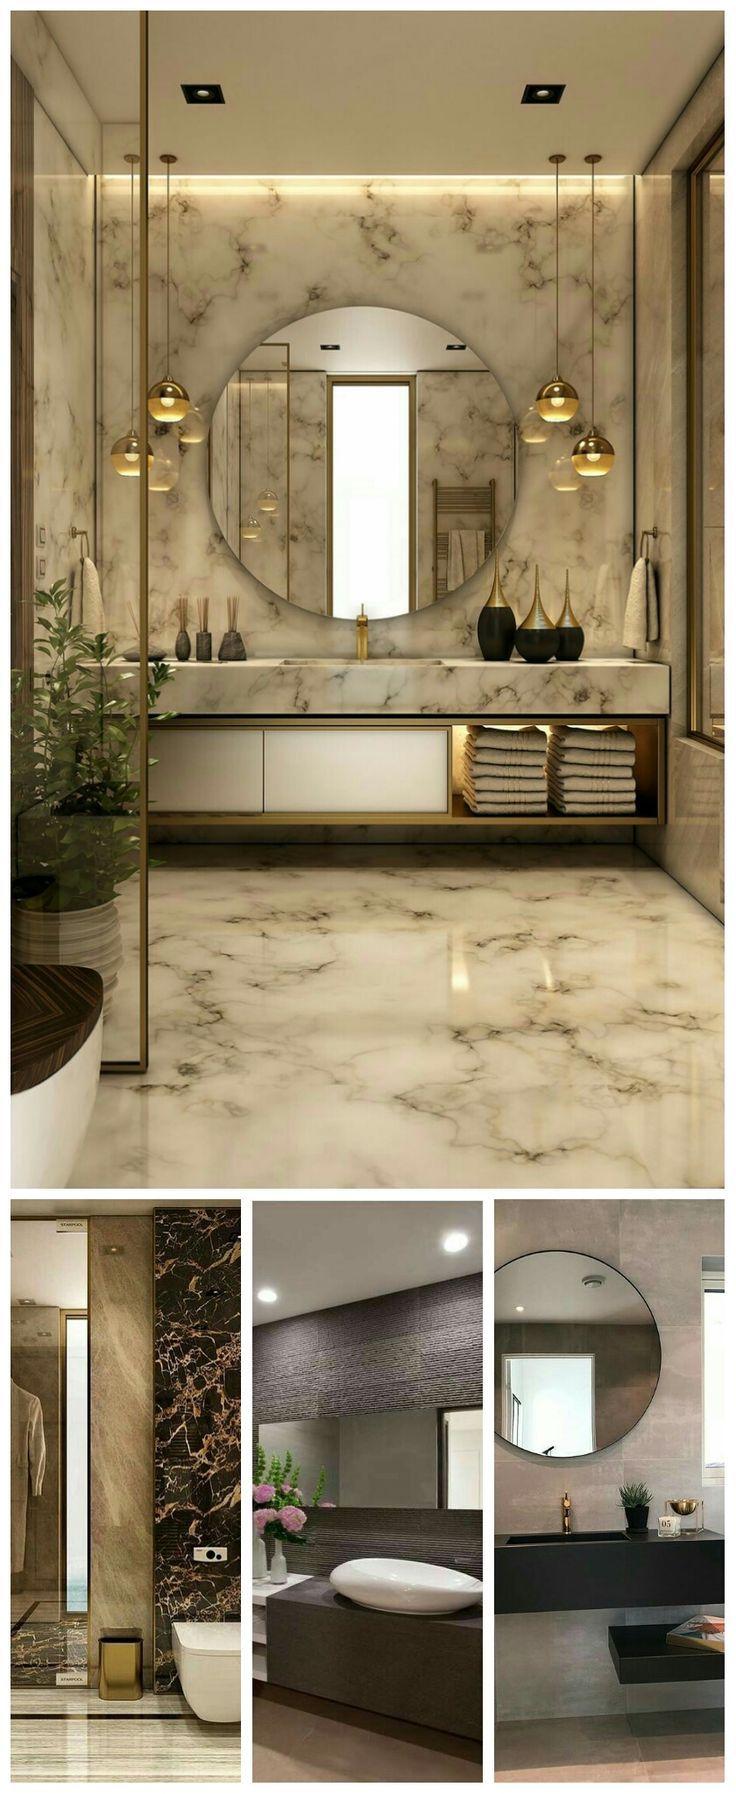 Luxury Bathroom Designs Gallery Luxury Modern Bathrooms Luxurious Master Bath Bathroom Design Luxury Bathroom Interior Design Modern Modern Bathroom Design